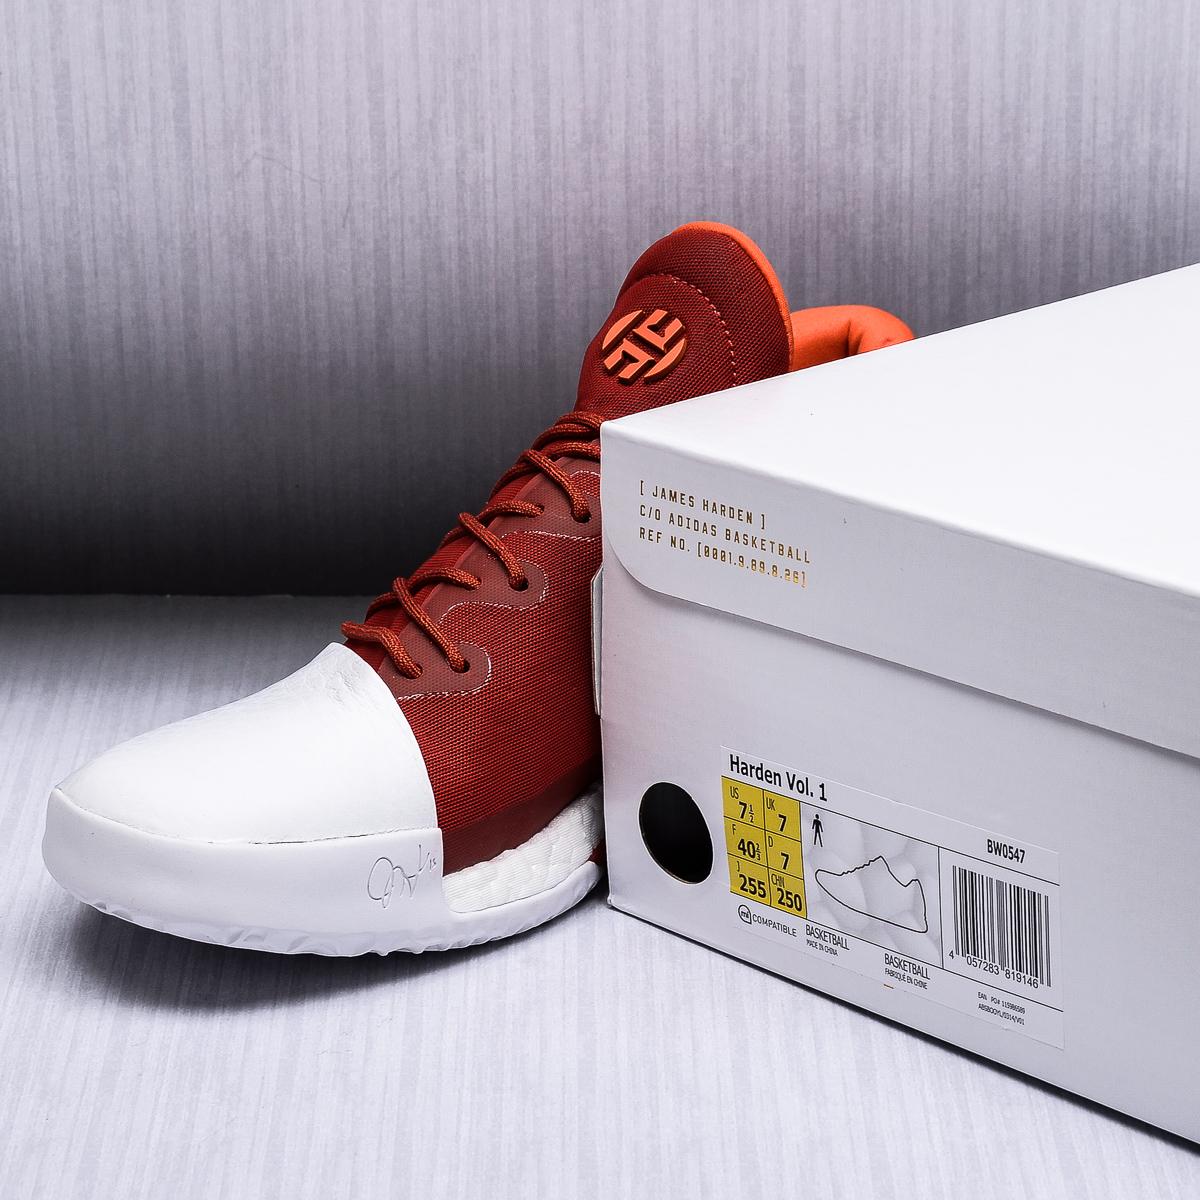 271b42c8b Adidas Sneakers Reddit Womens Shoes Slip Ons